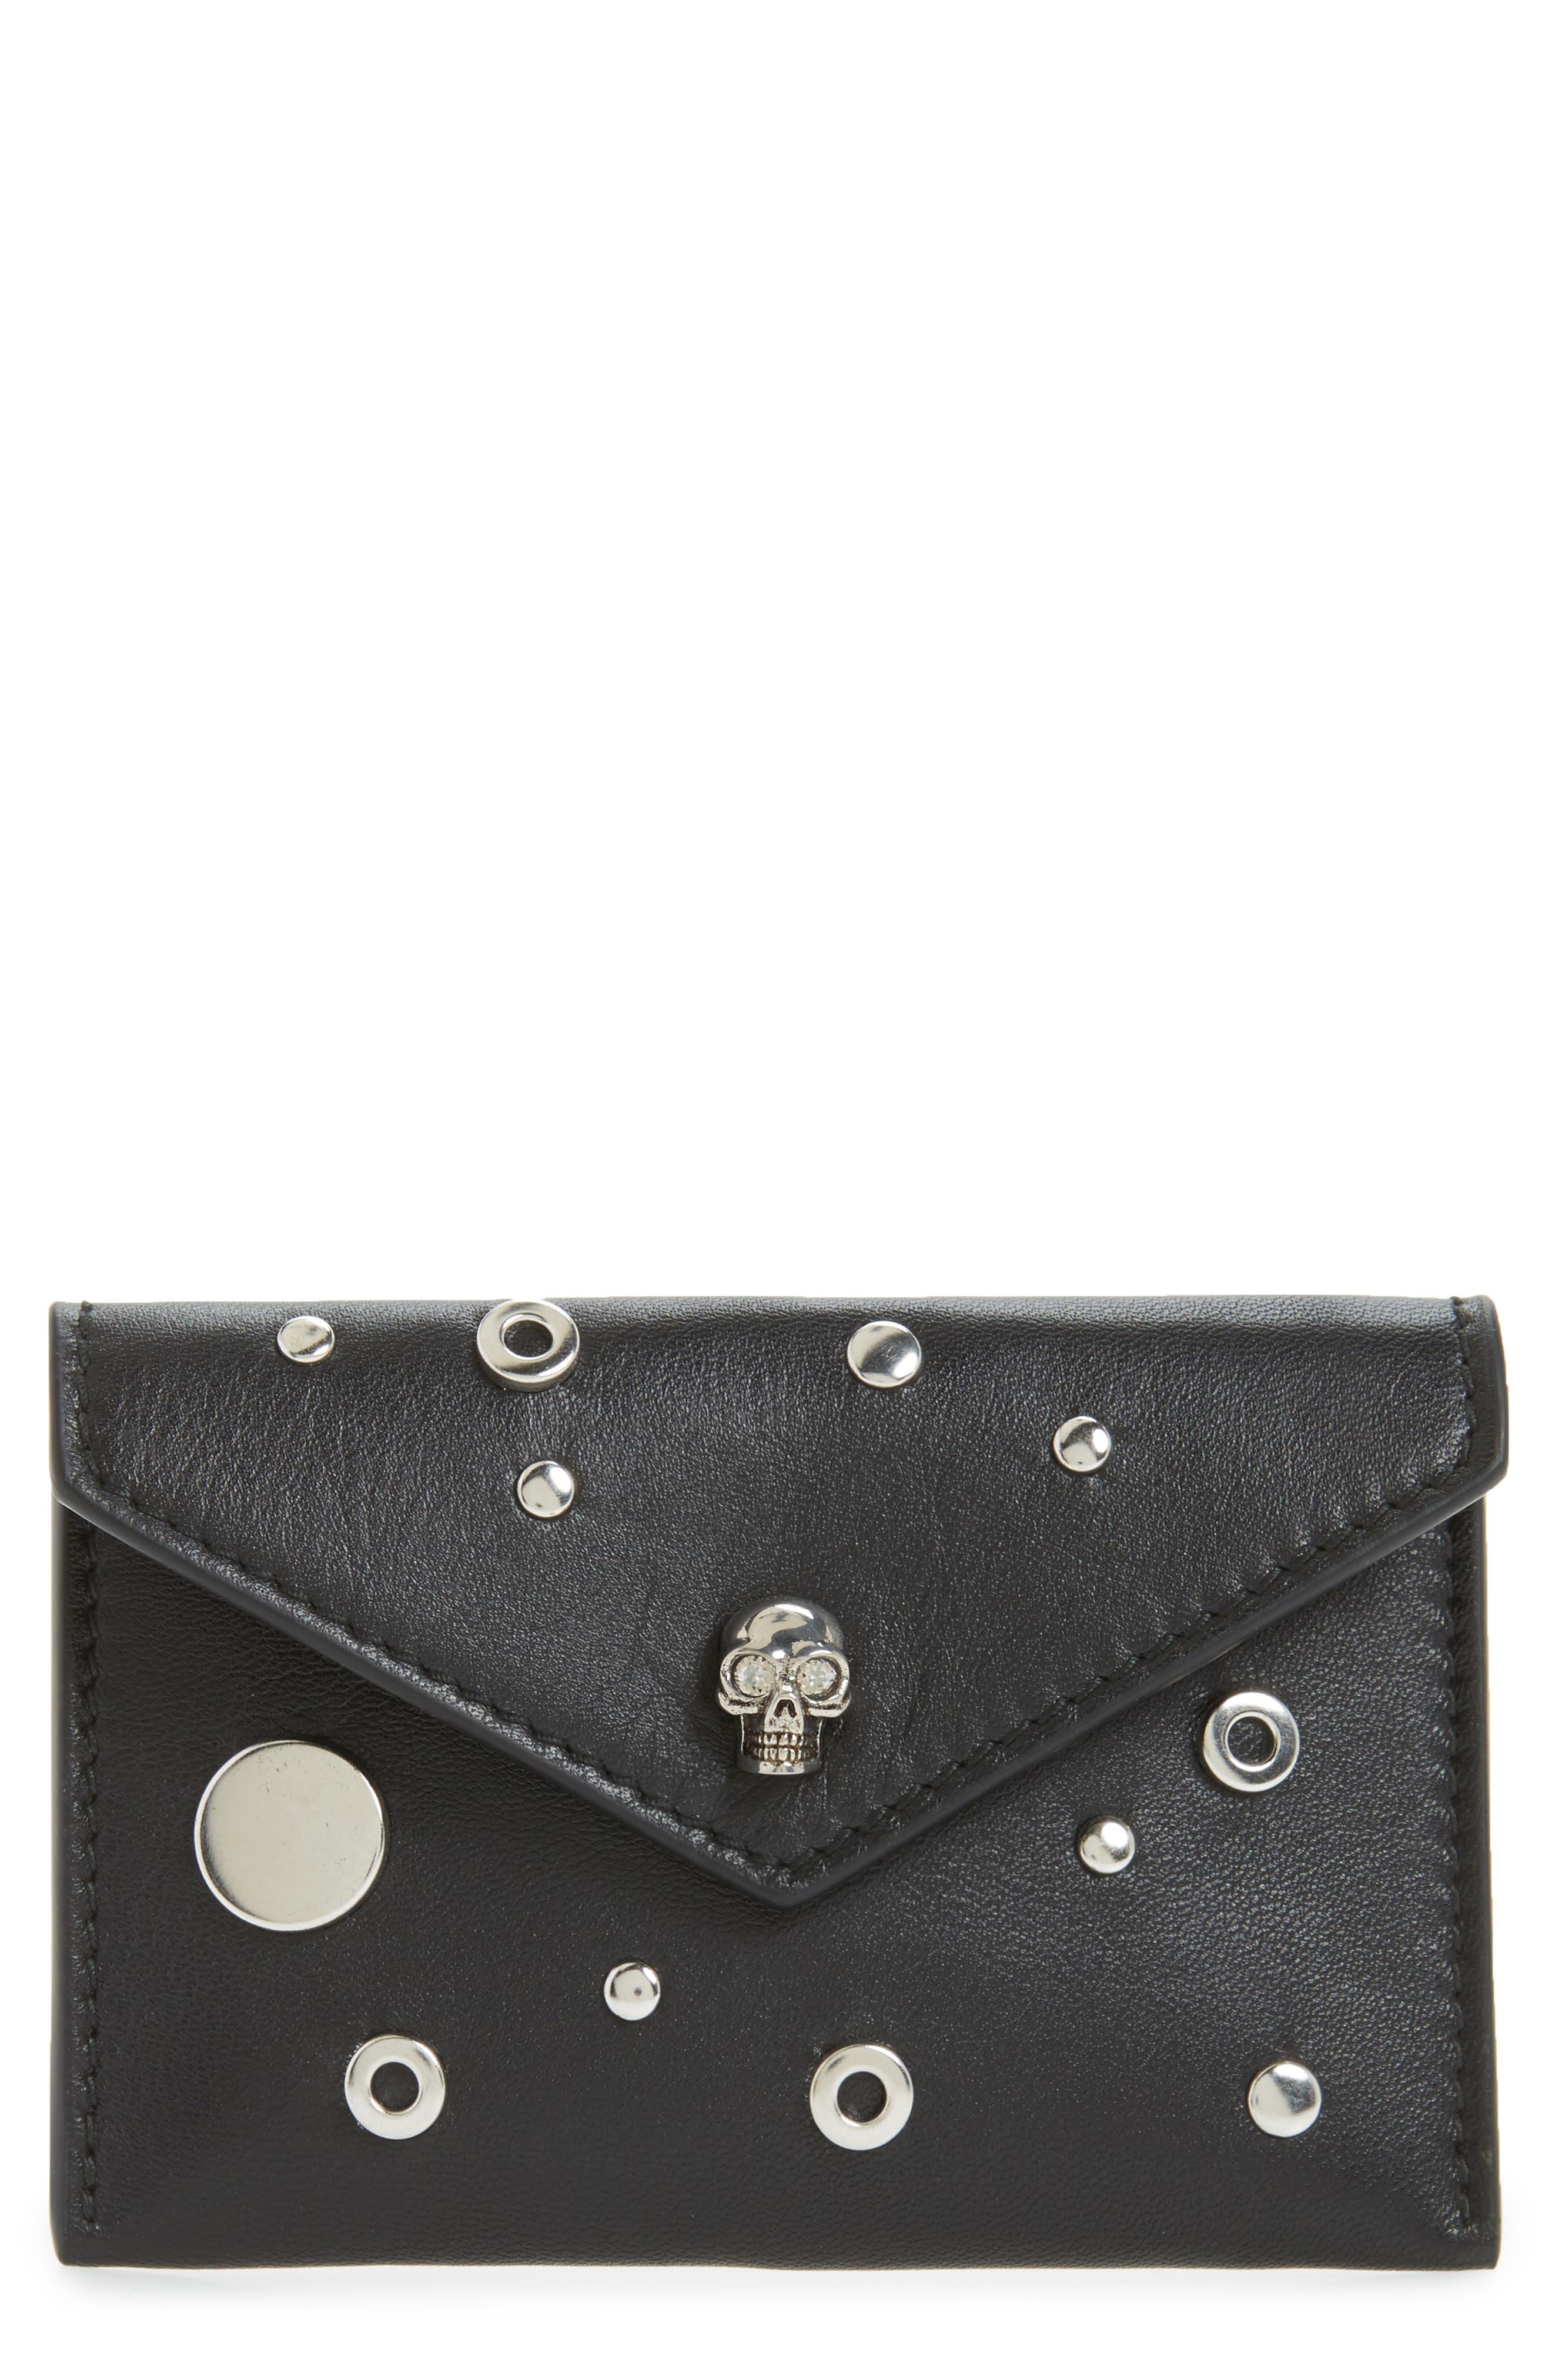 Calfskin Leather Envelope Card Holder,                             Main thumbnail 1, color,                             001